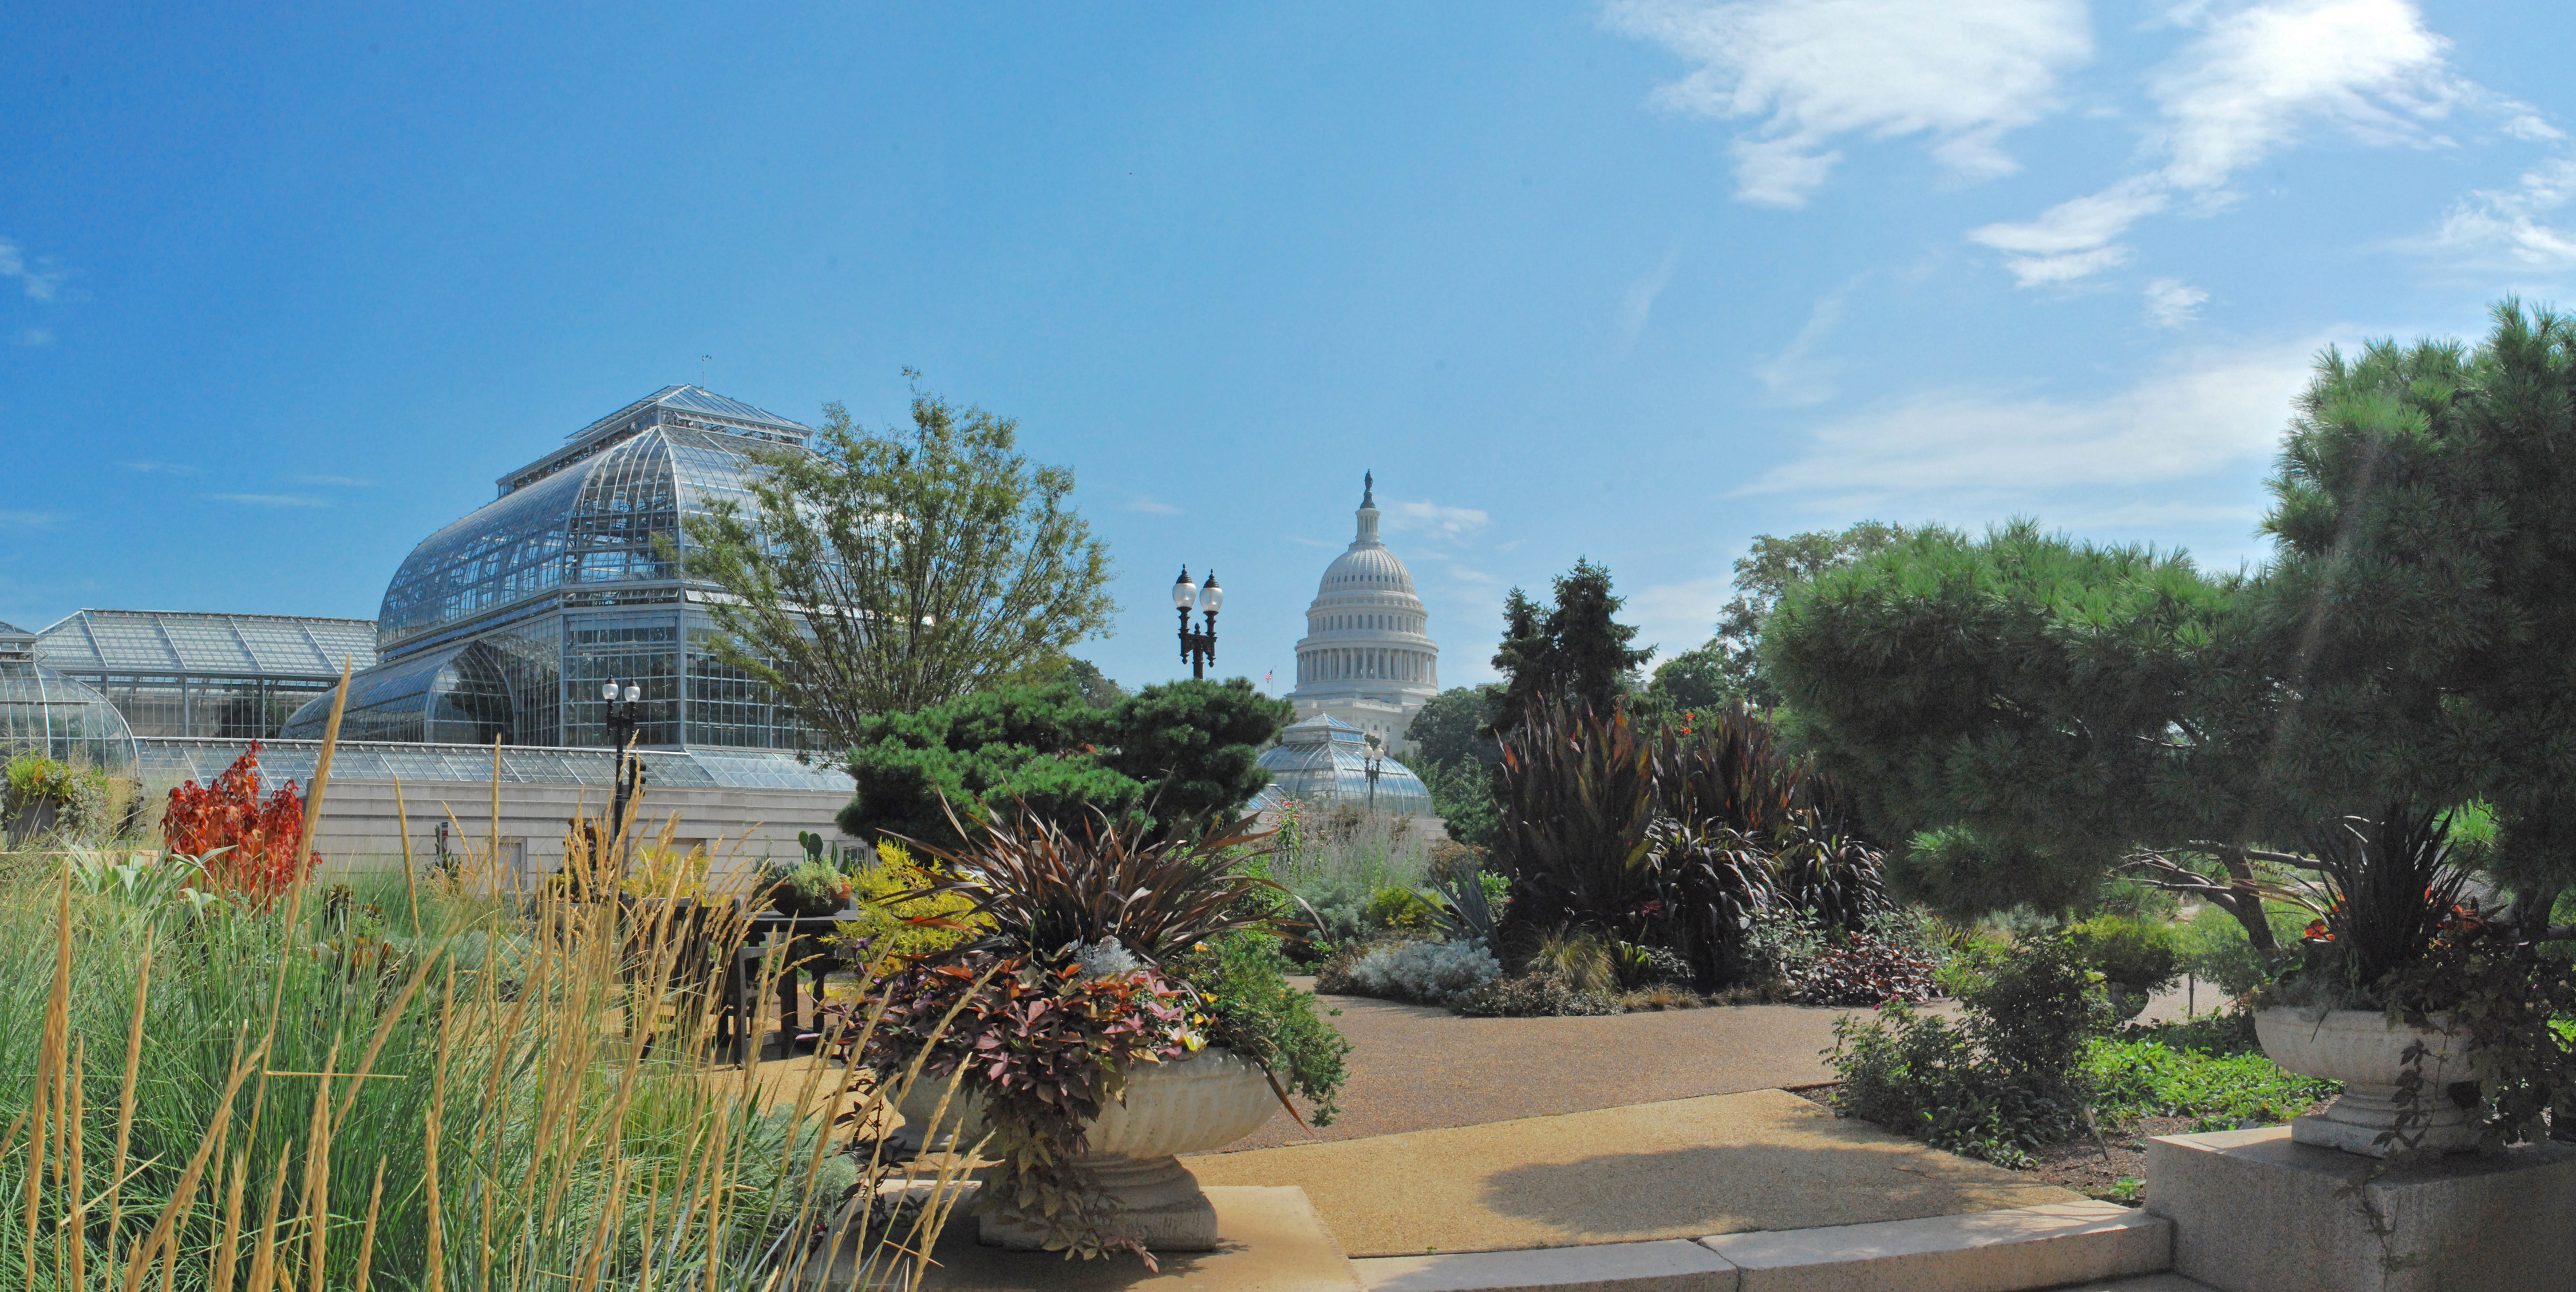 us botanic garden - Us Botanic Garden